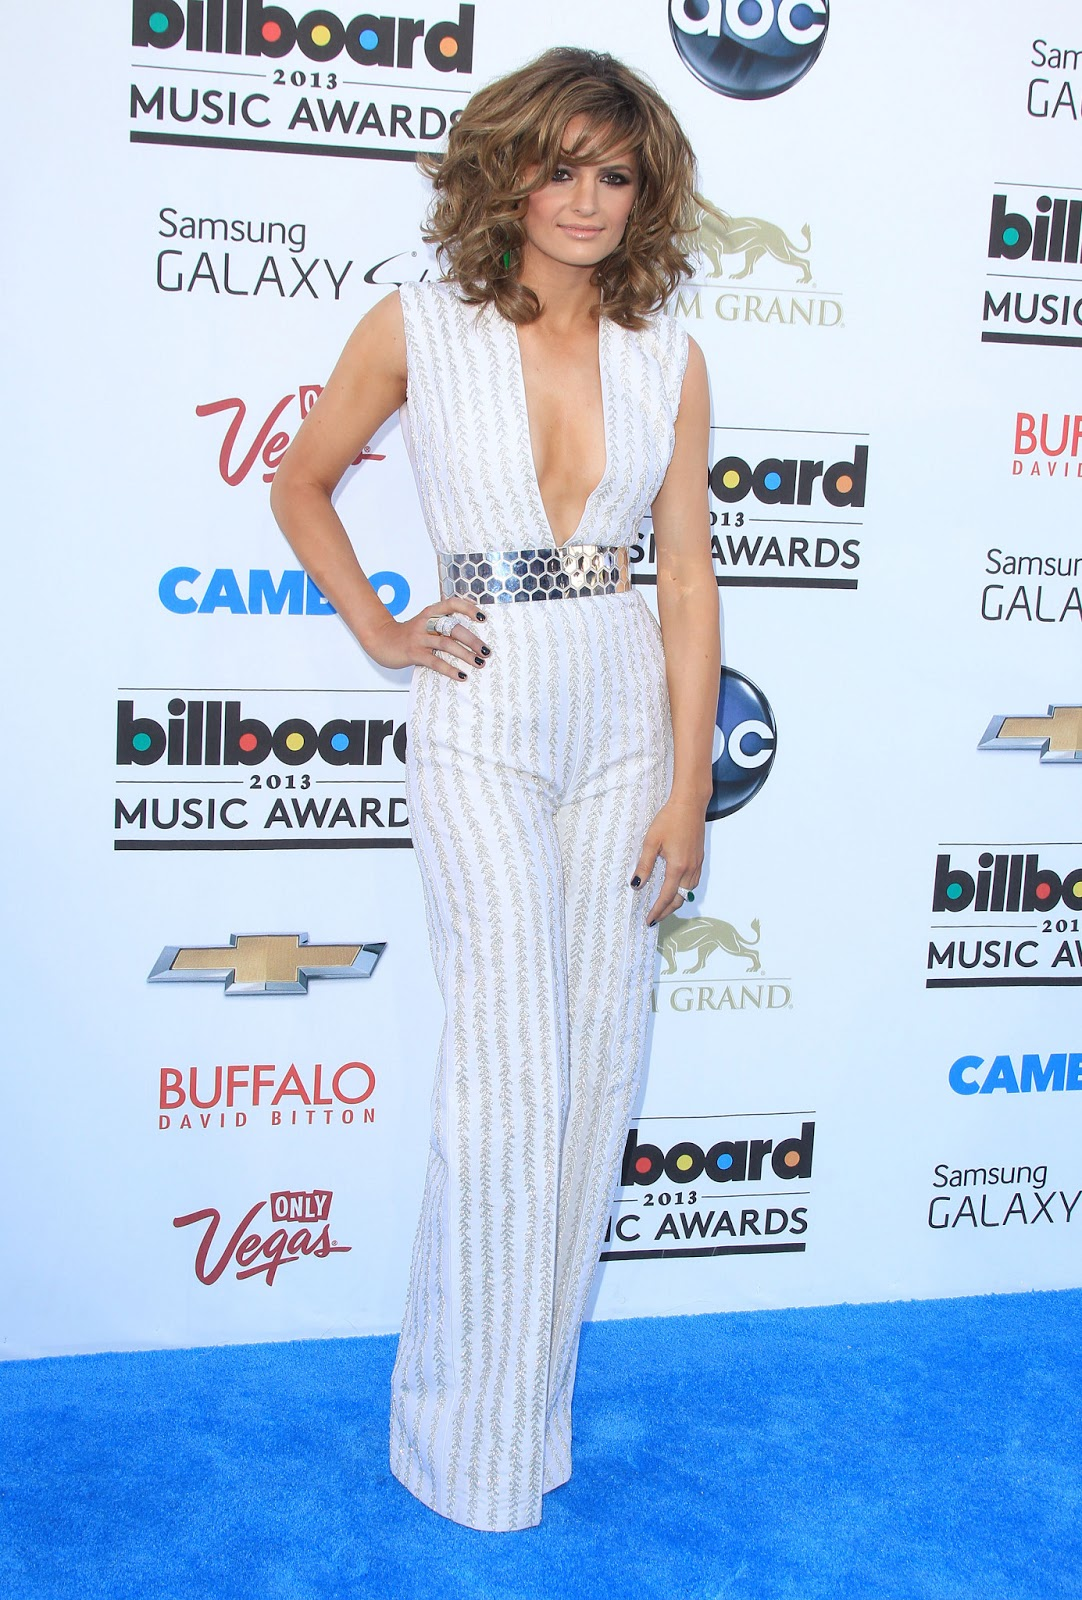 Billboard Music Awards 2016 The Best Hair And Makeup: Stana Katic - 2013 Billboard Music Awards